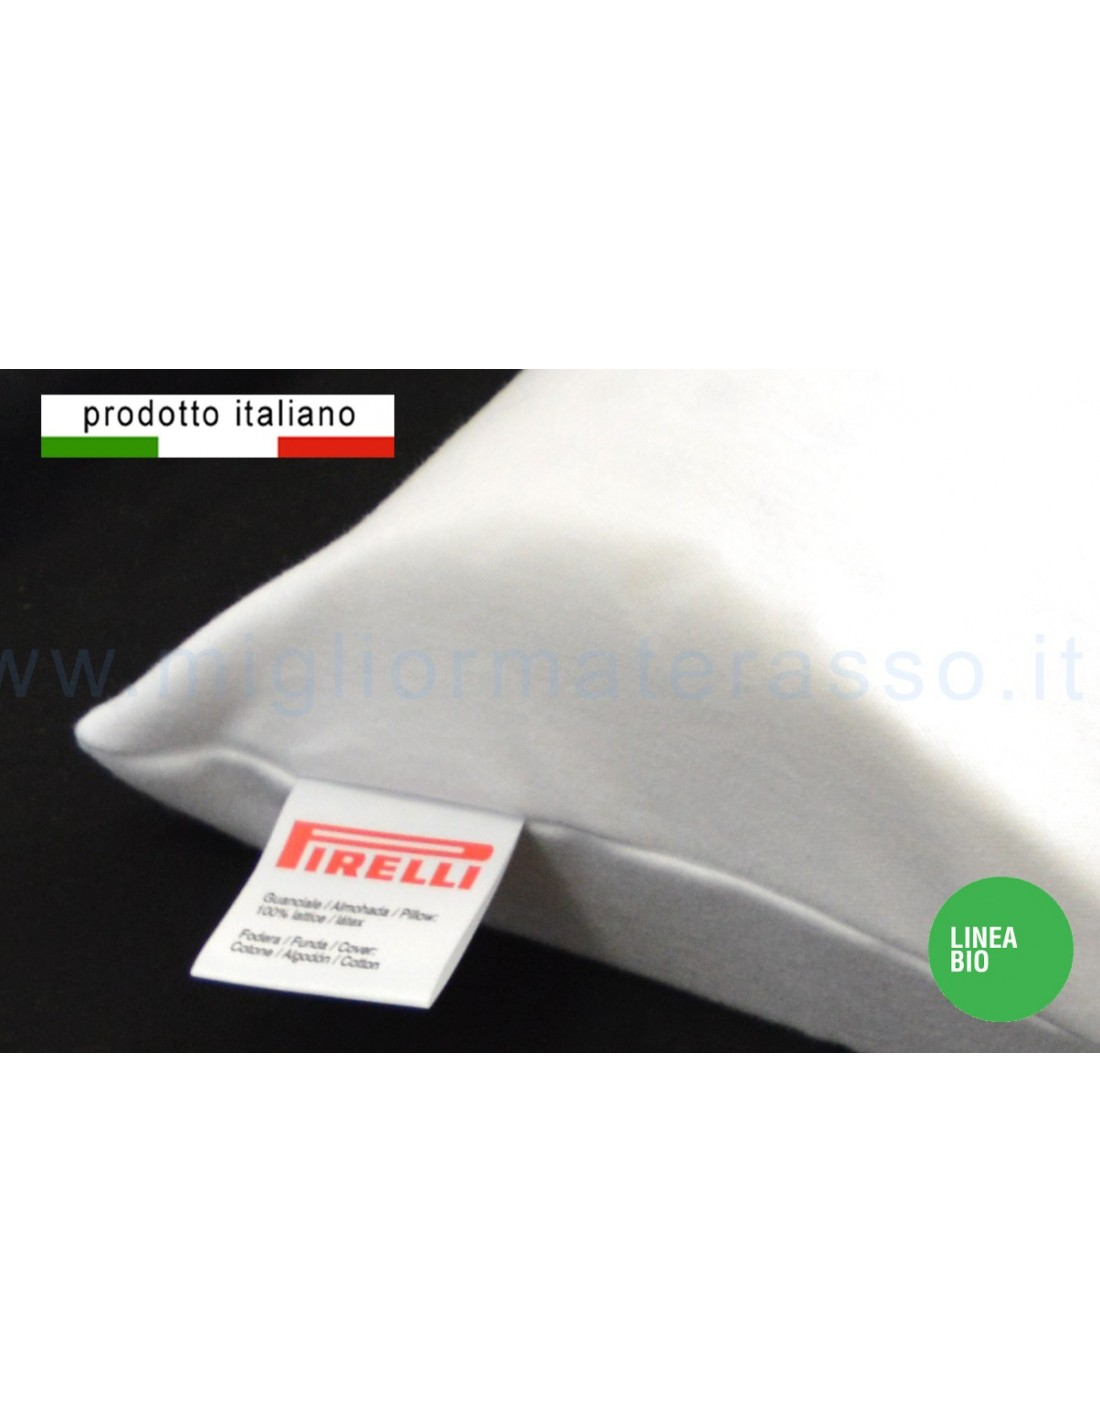 Cuscini Pirelli Lattice.Cuscini Cervicale Lattice Pirelli Acquista Prezzi Offerte Online